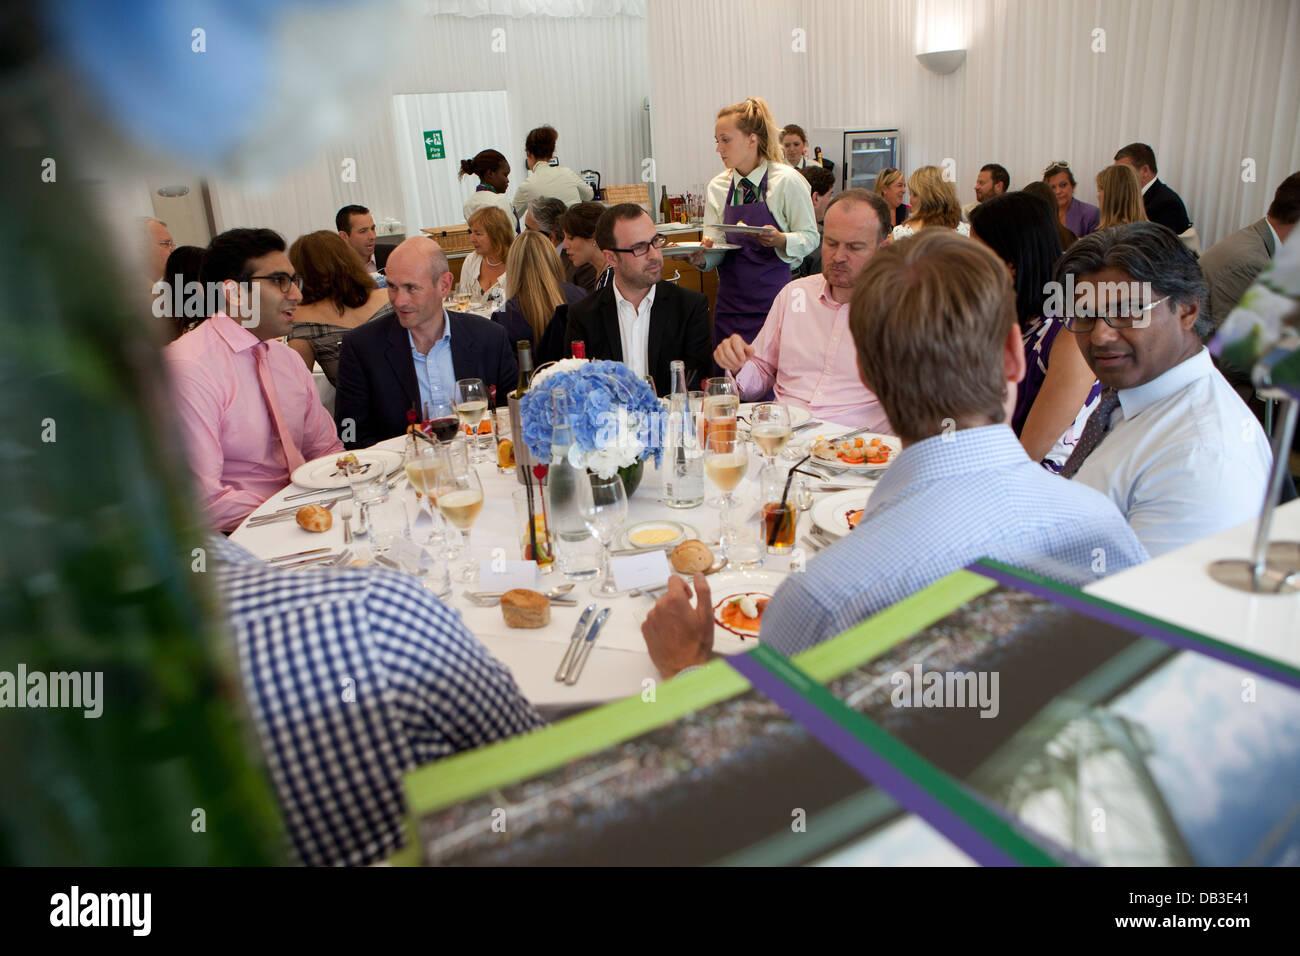 Marquee Corporate Area Hospitality Radisson Hotels i campionati di Wimbledon 2012 Immagini Stock